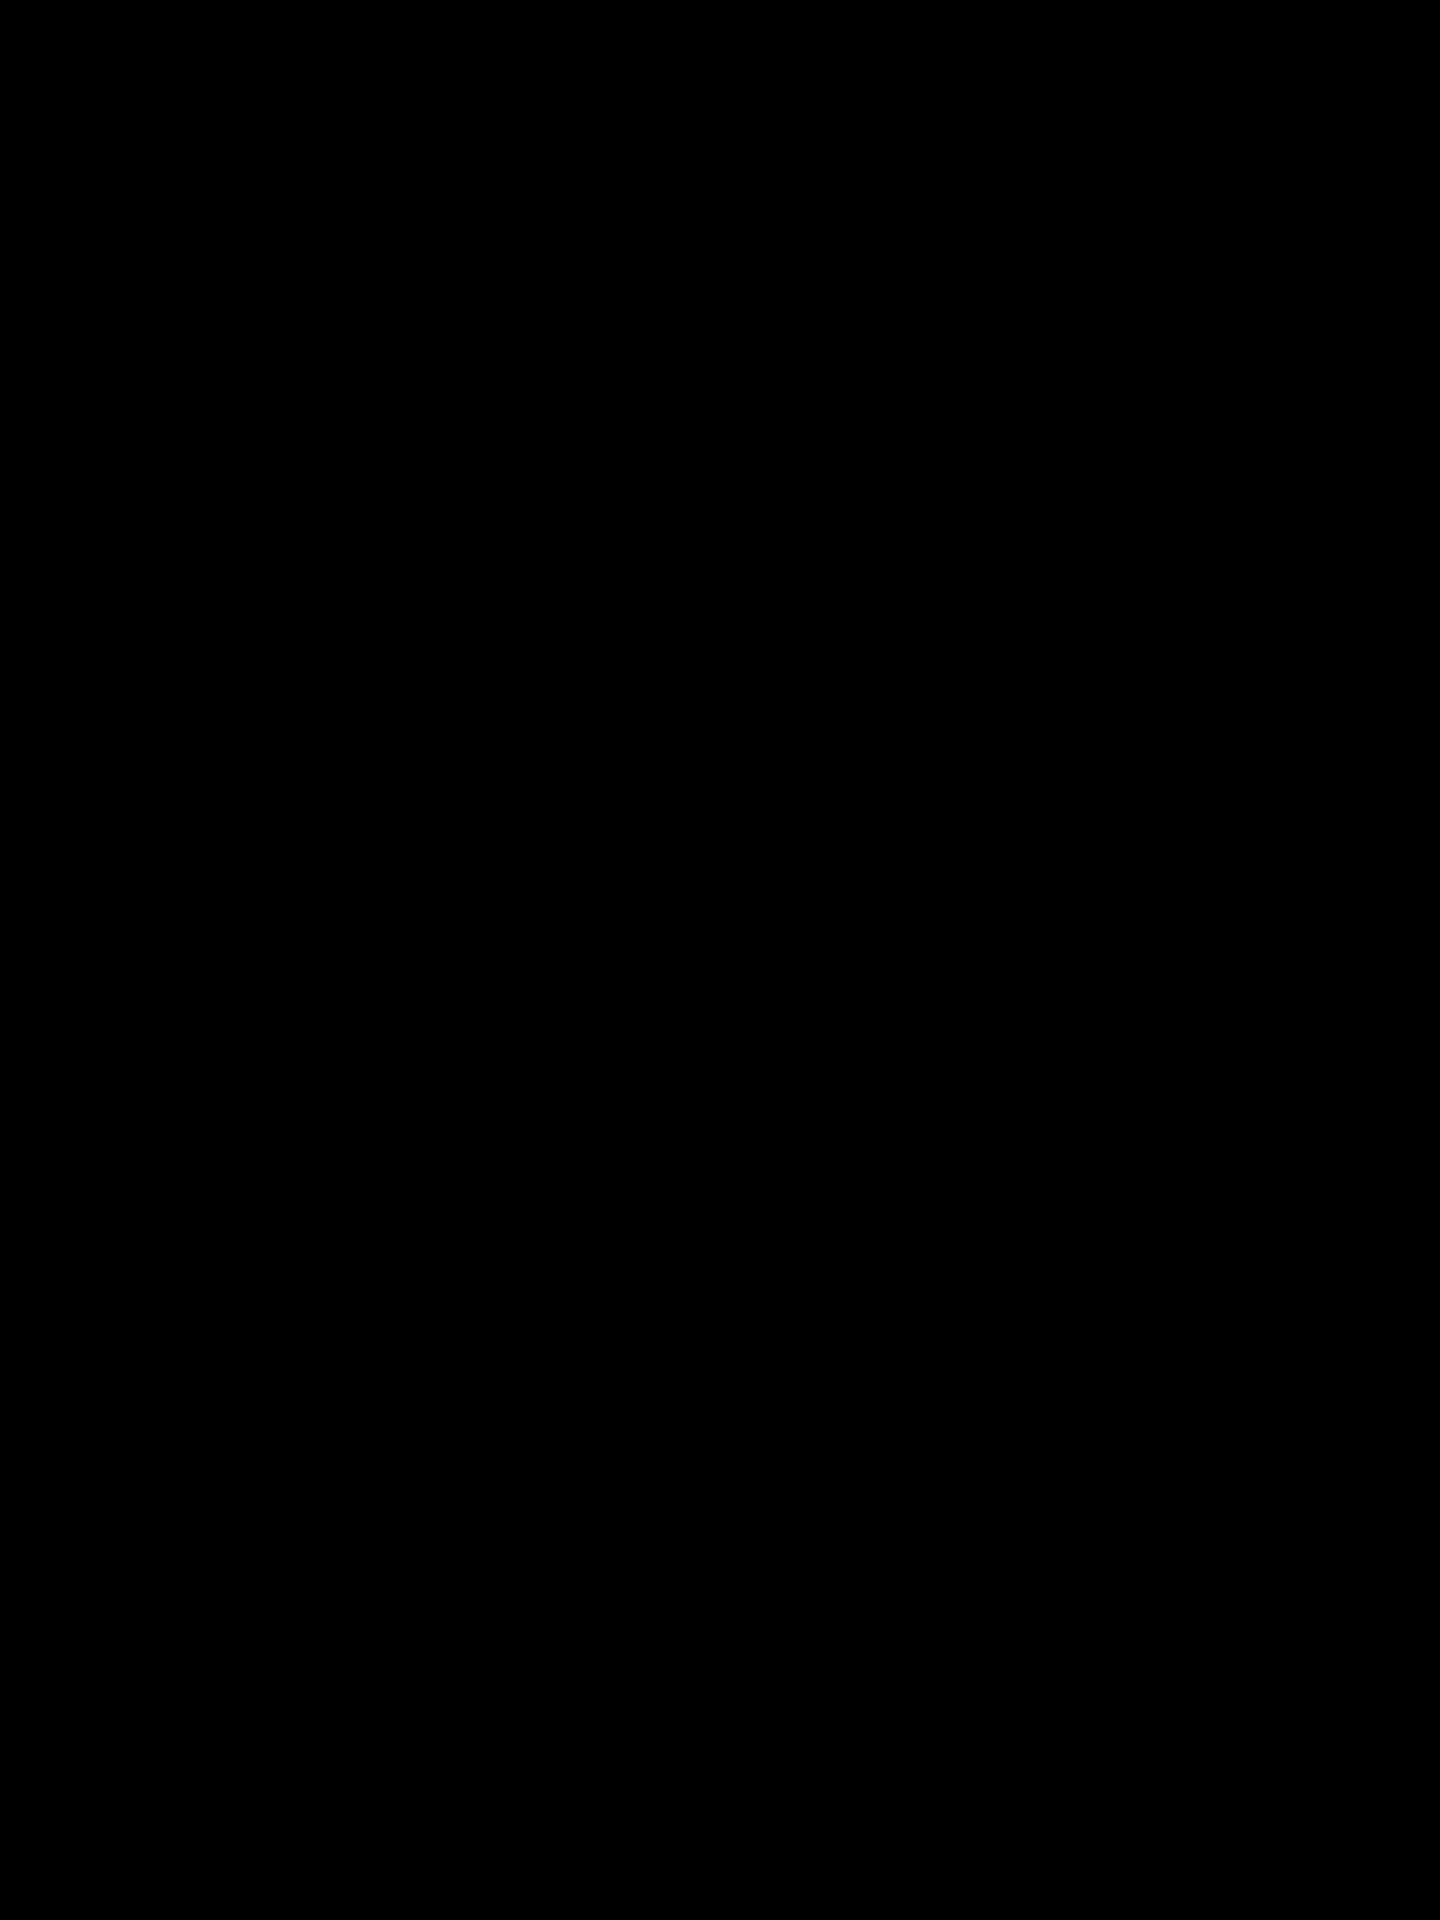 silhouette-2817251_1920